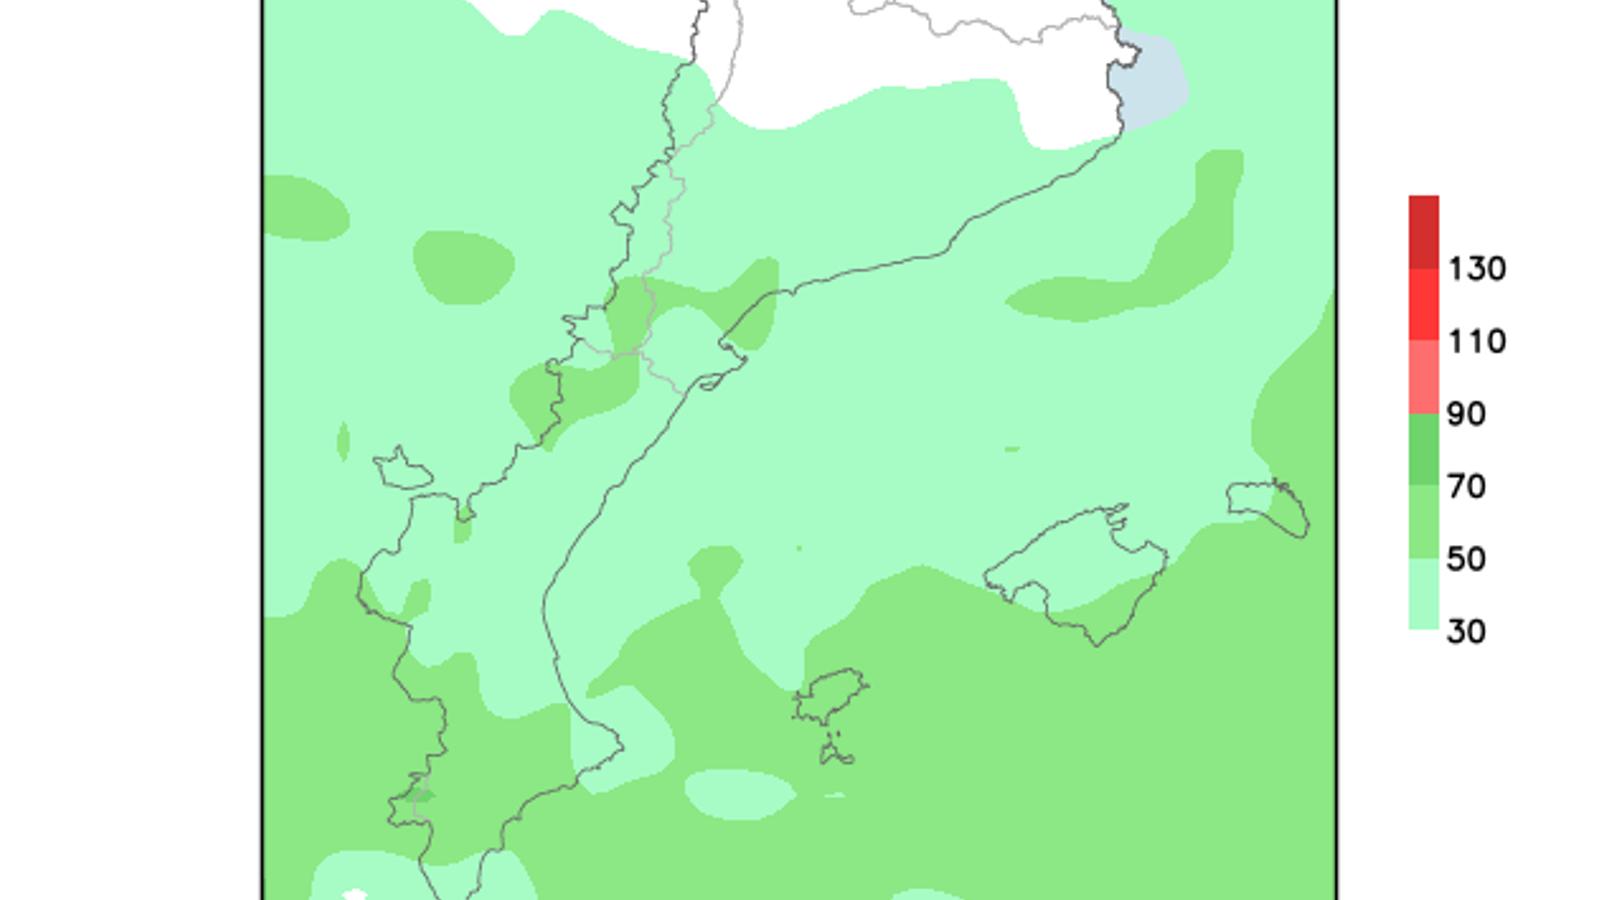 Alerta groga a les Balears per vent fort